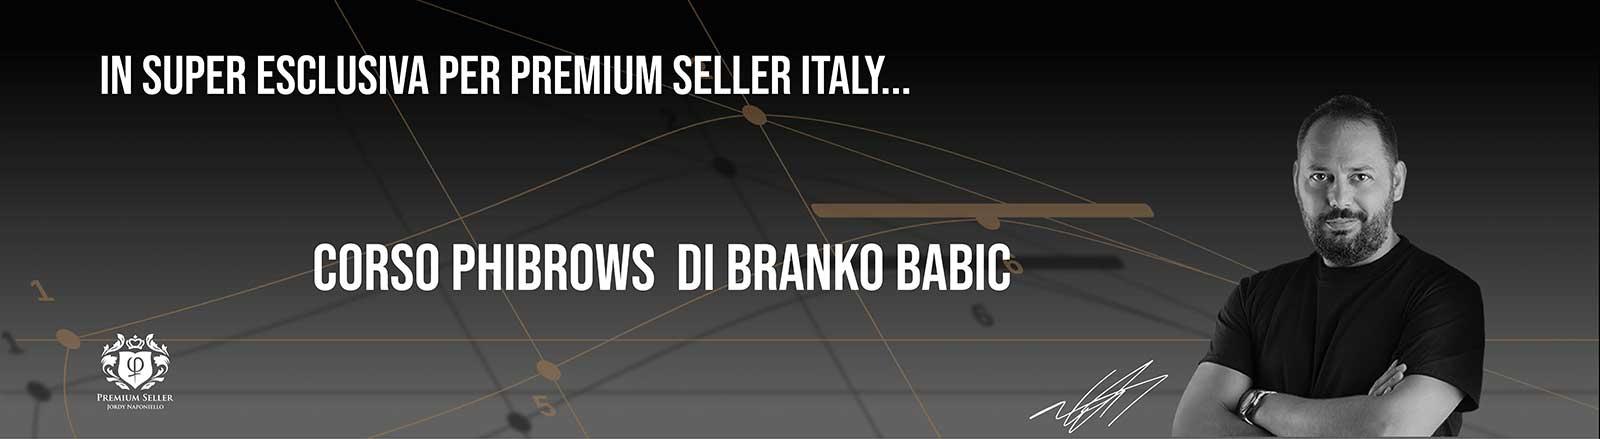 banner-branko_Tavola-disegno-1